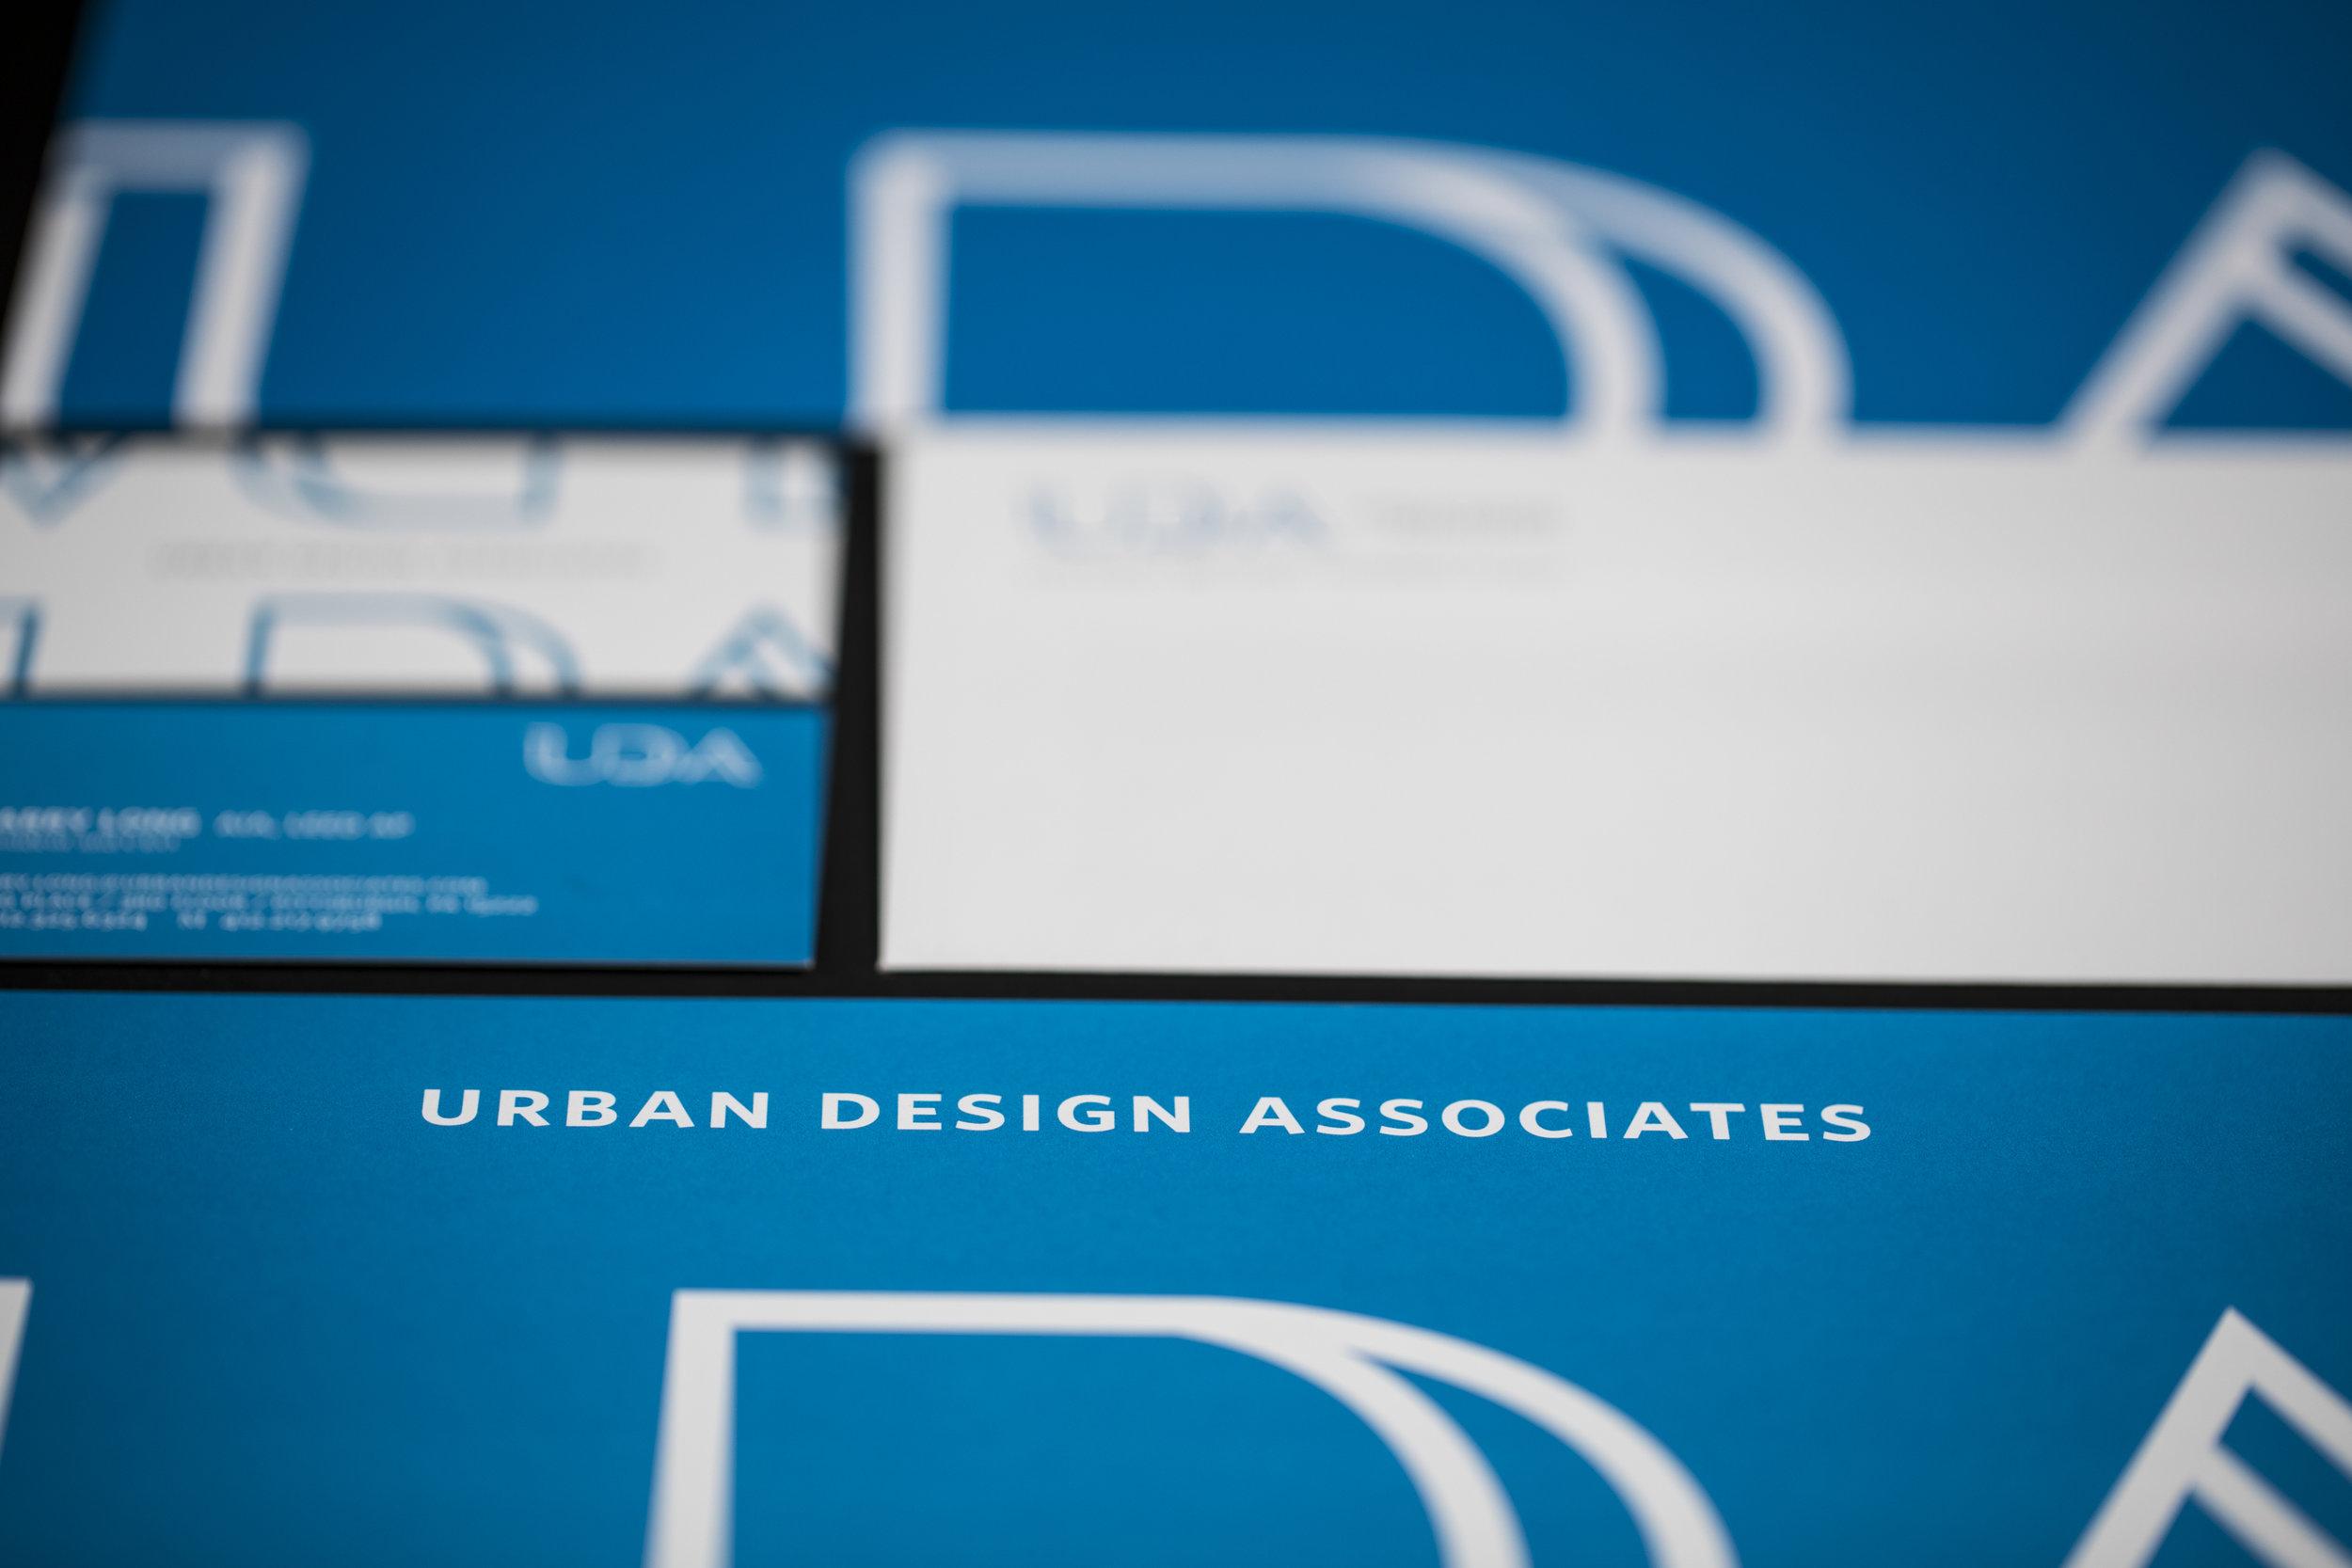 Design-and-Architcture_Branding_Urban-Design-Associates_Bootstrap-Design-Co_Stationary-1.jpg